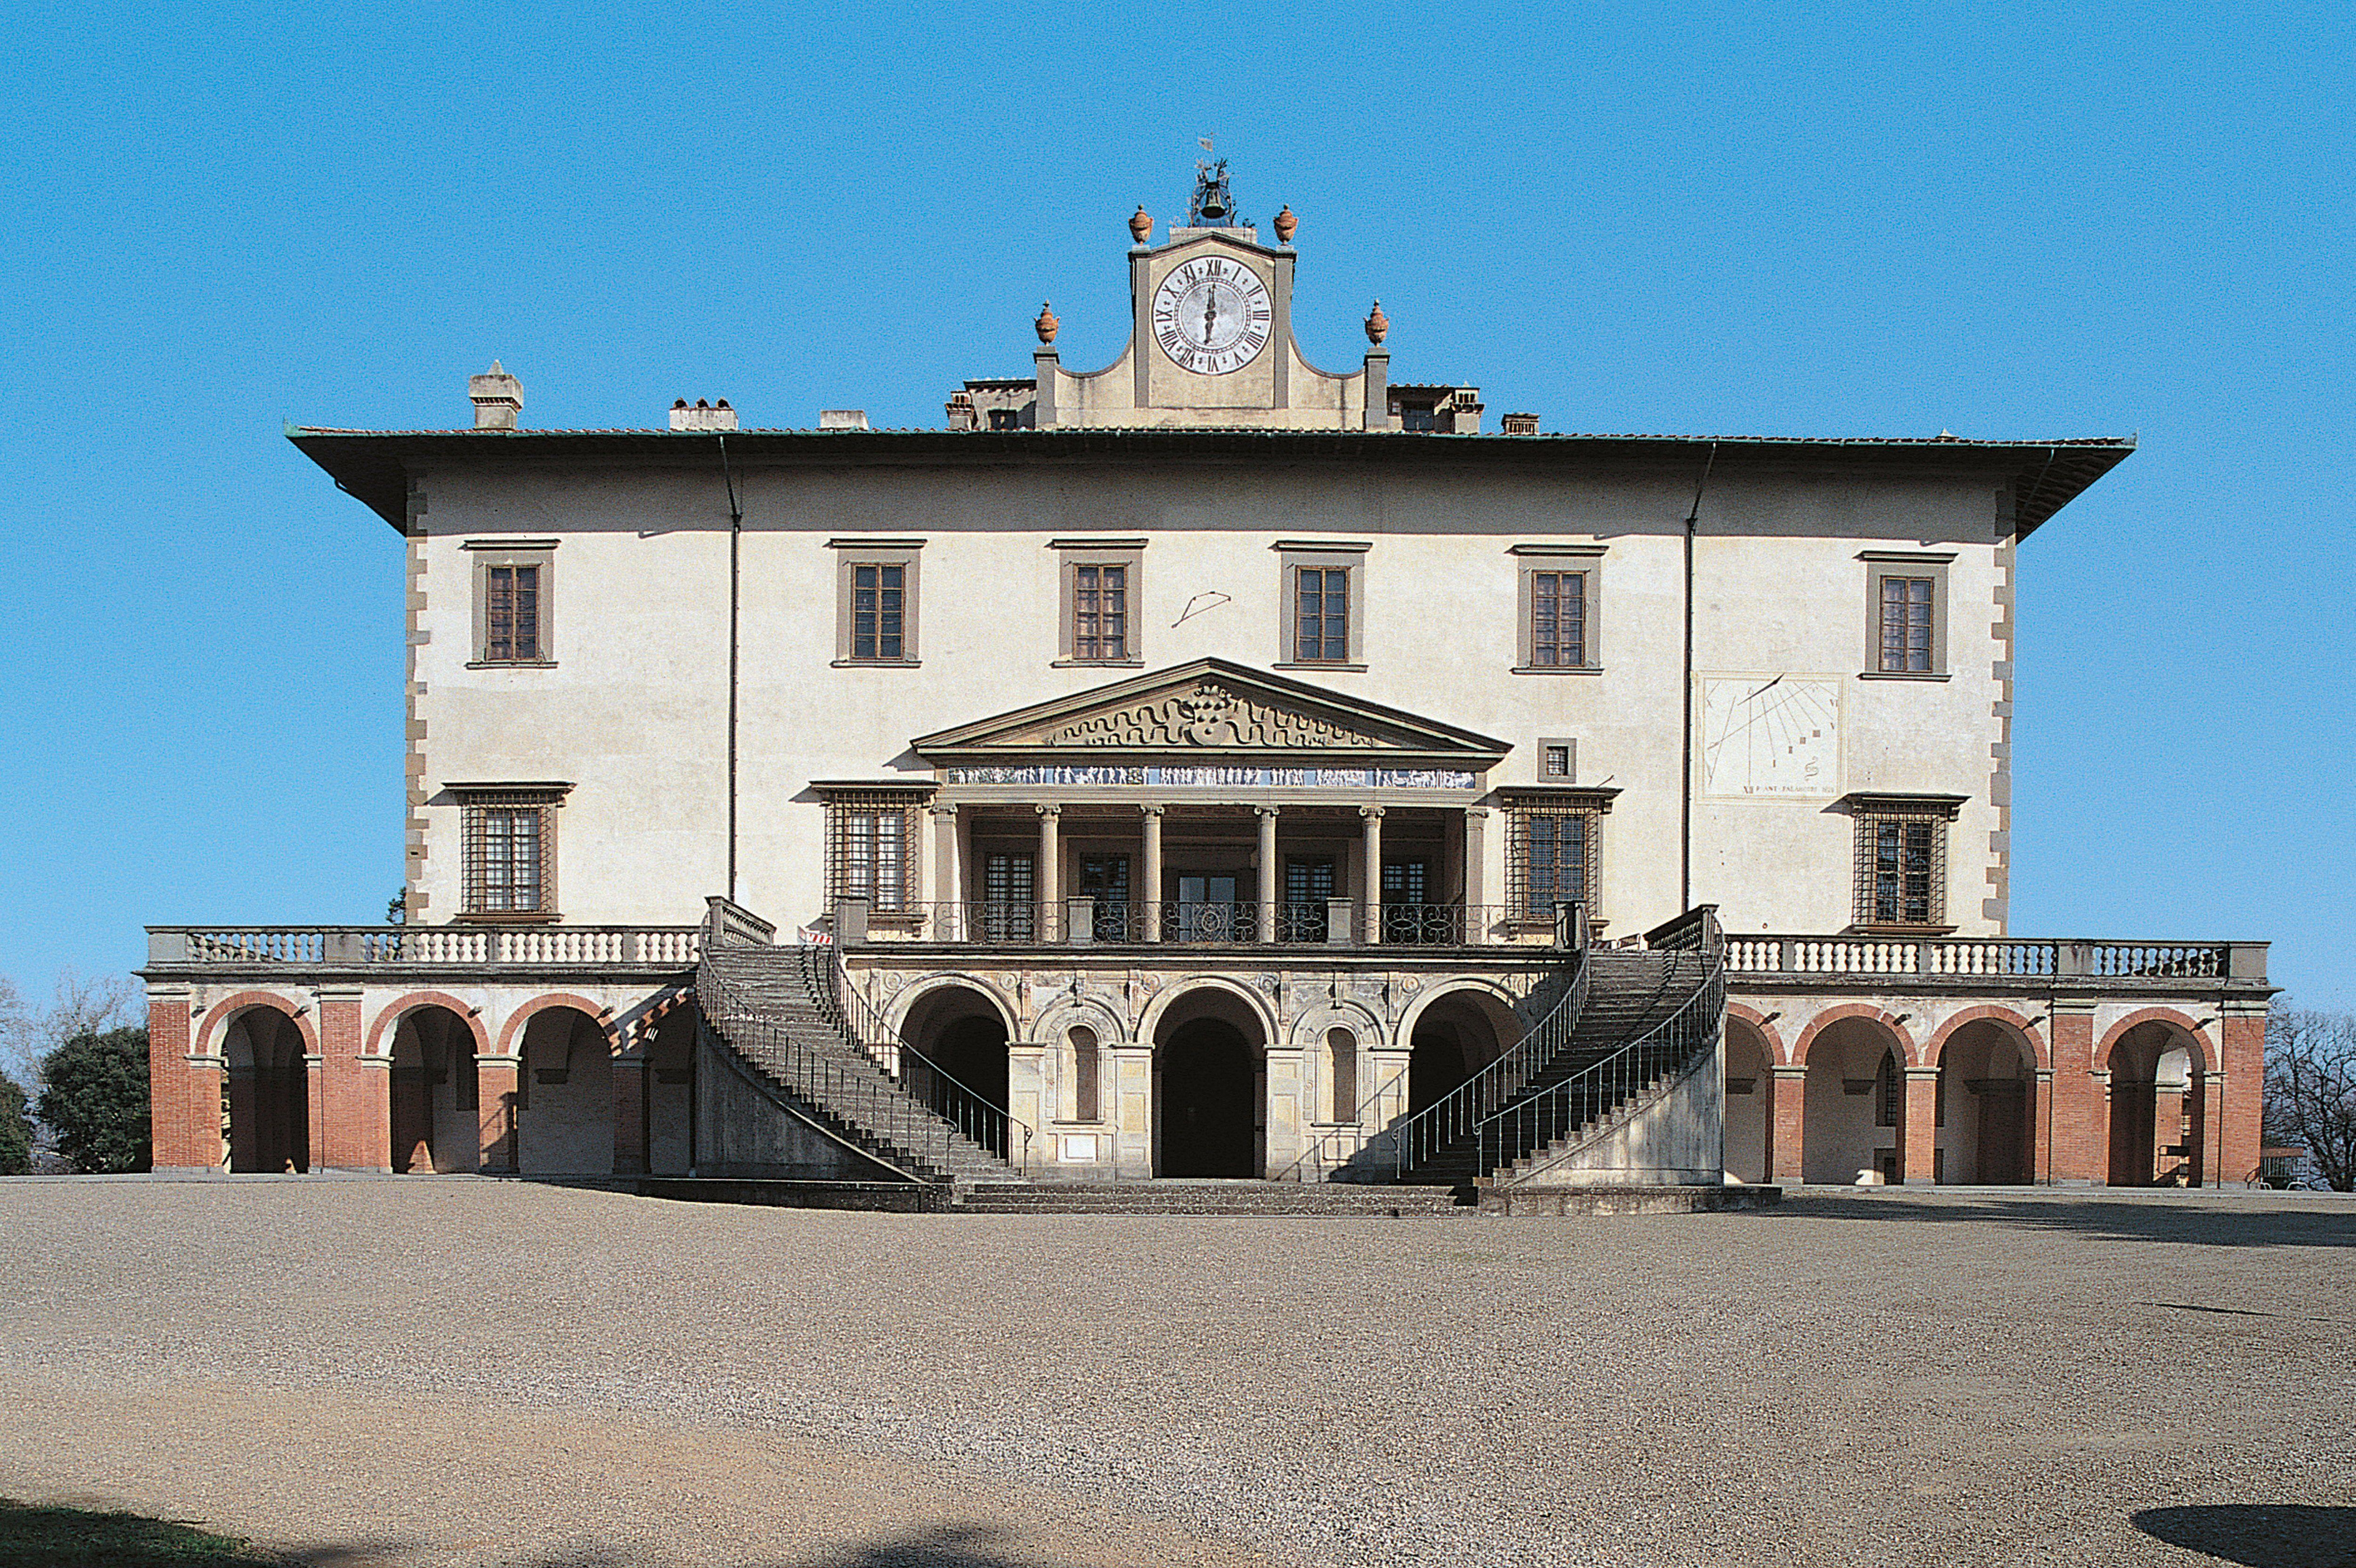 double flight of steps lead into Villa Medici in Poggio a Caiano Italy